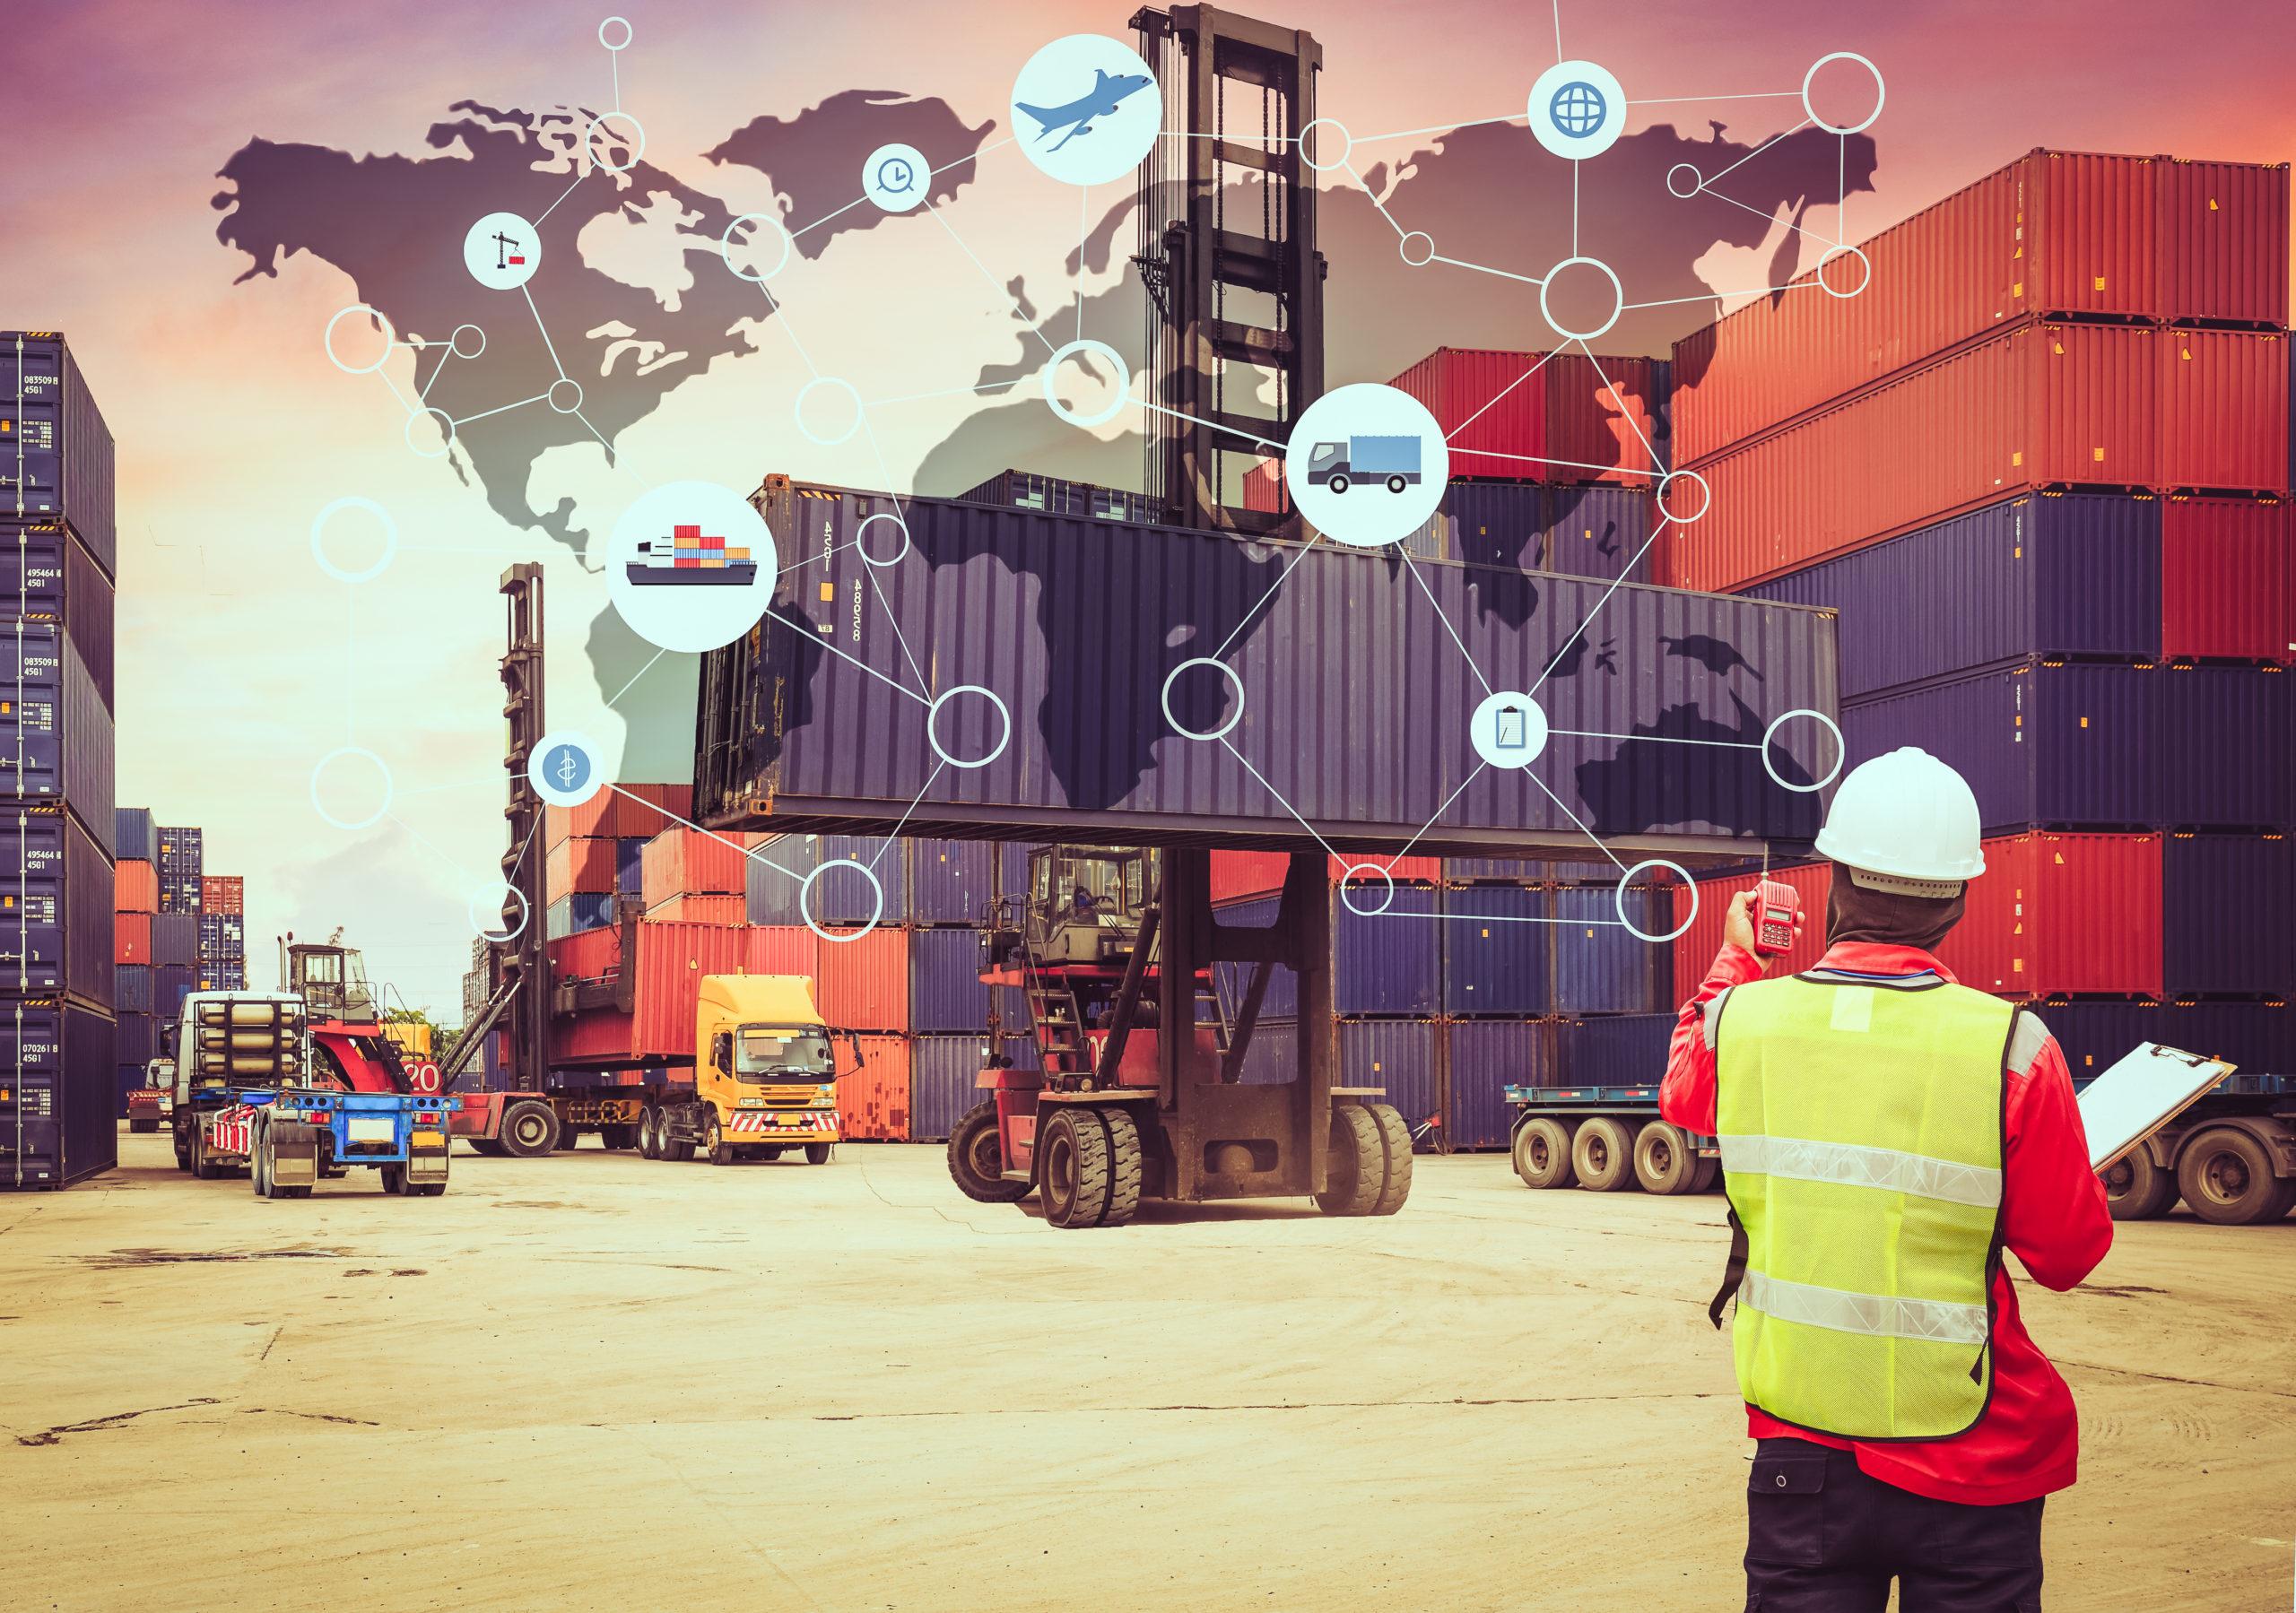 development of smart port technology